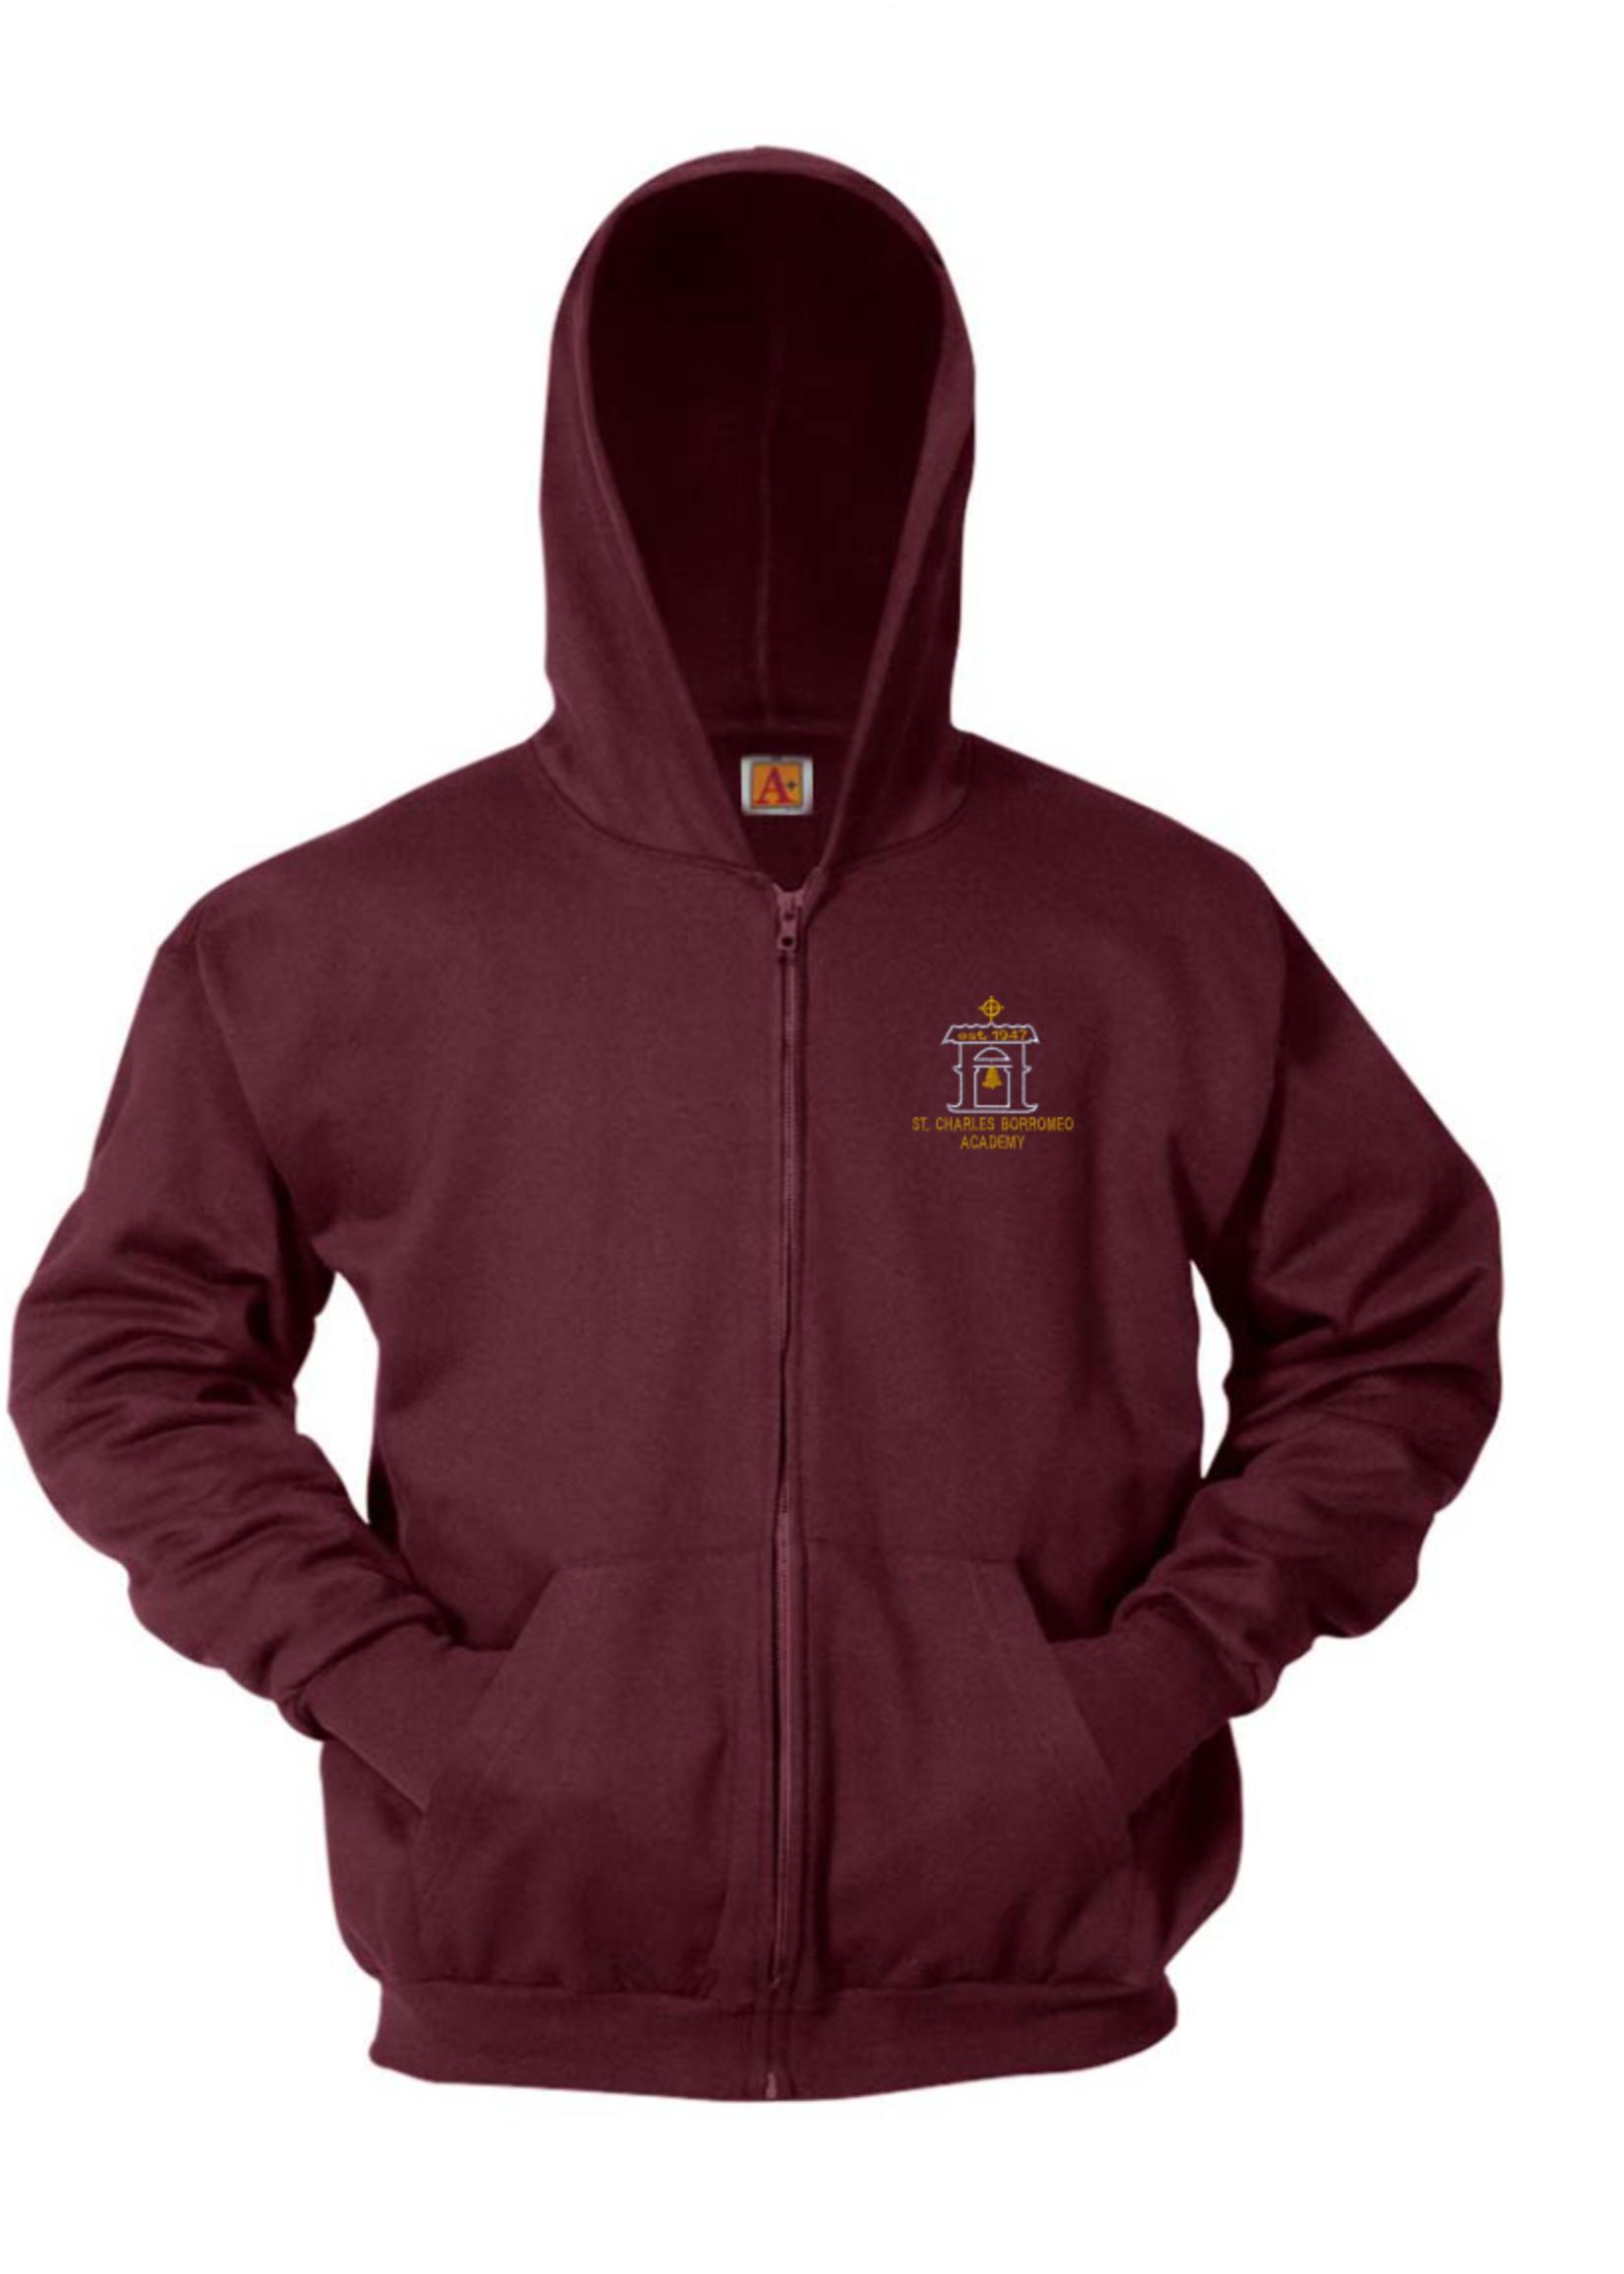 SCBA Wine Hooded Full Zip Sweatshirt